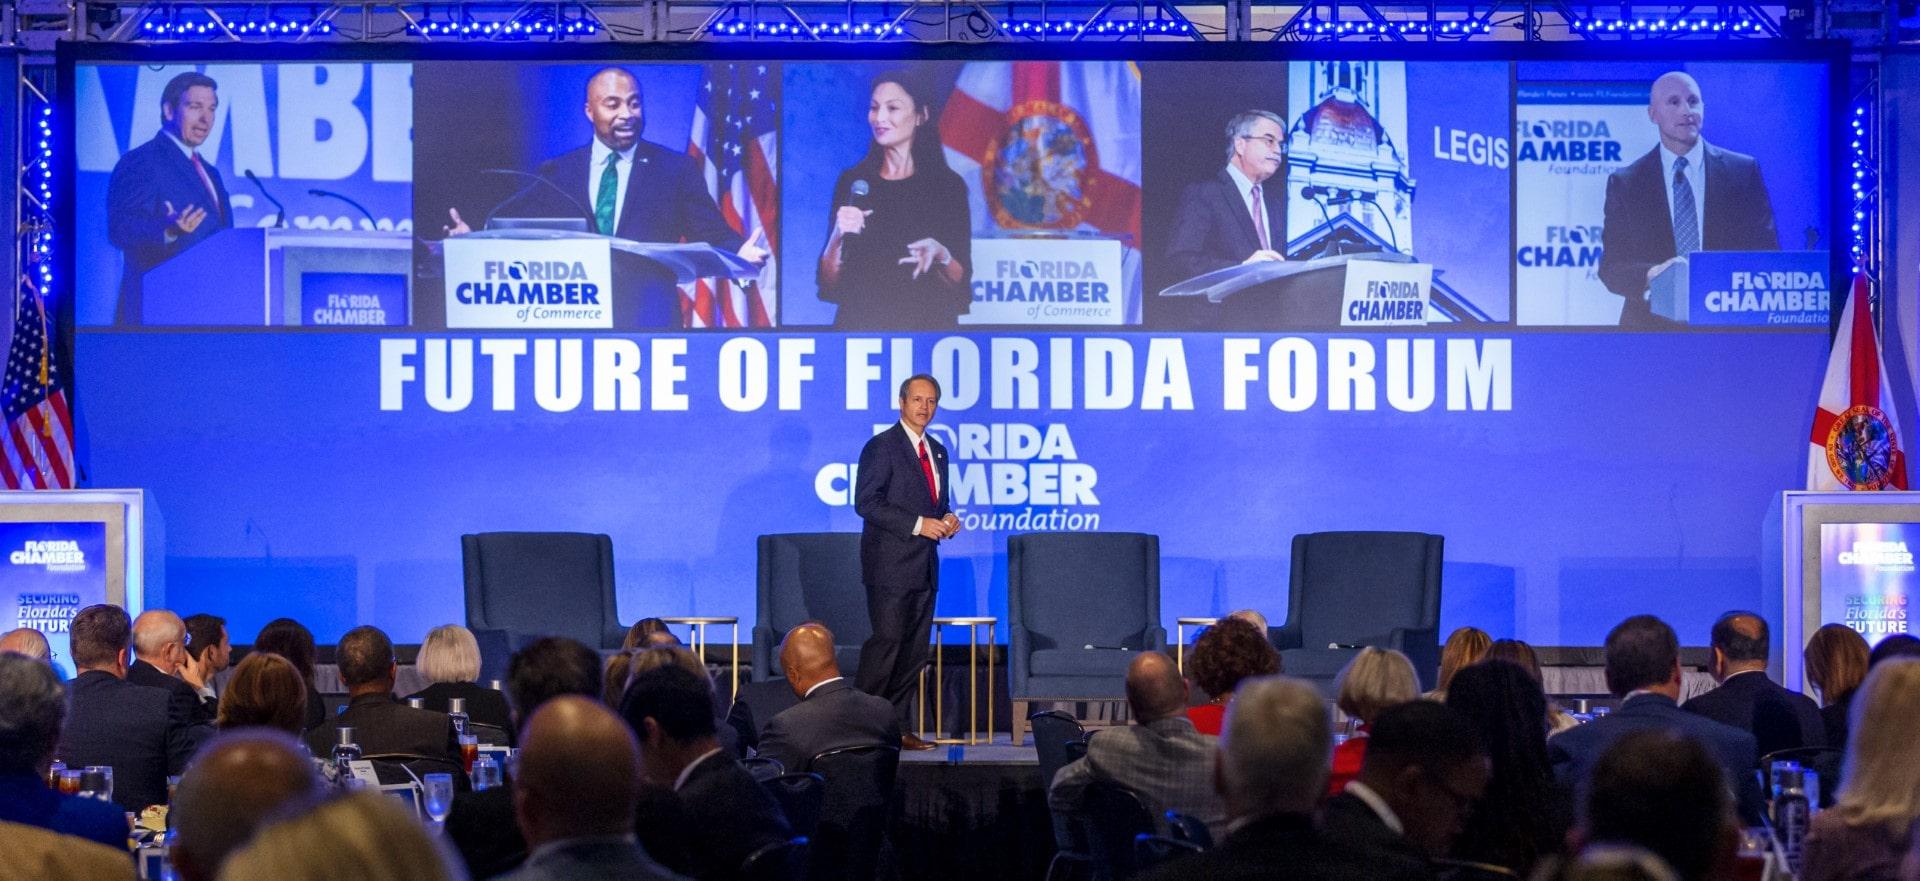 FUTURE-OF-FLORIDA-9-Large.jpg